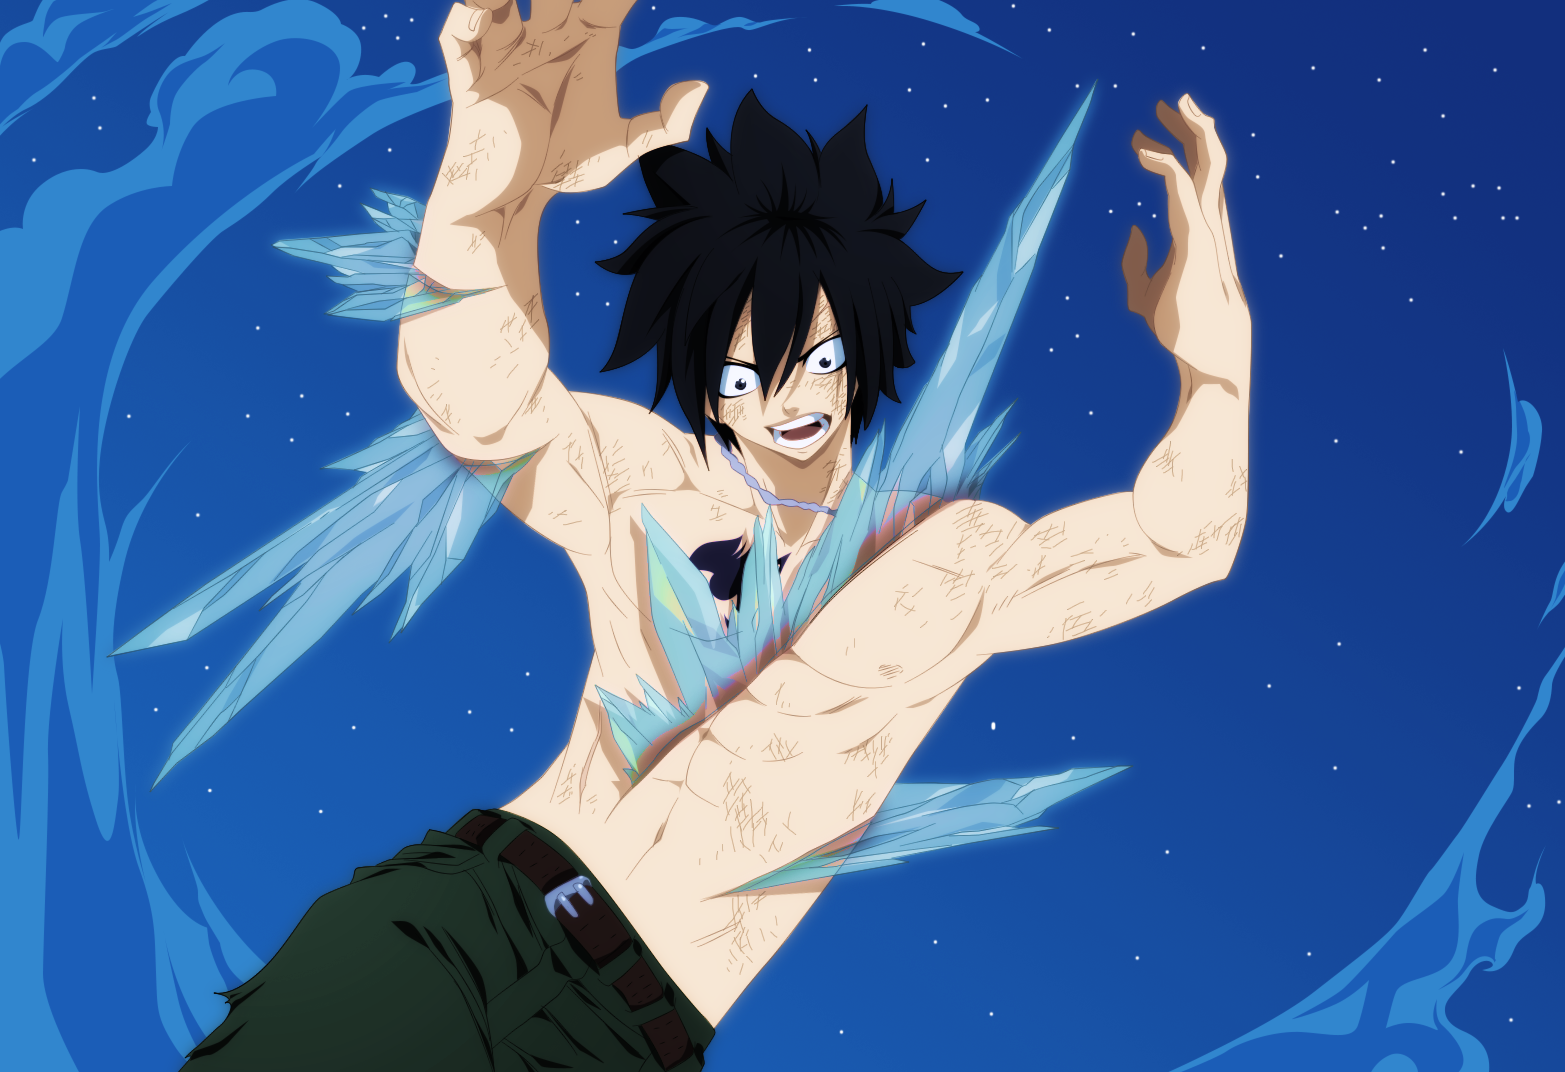 Ver Anime Online - InkAnime.Com